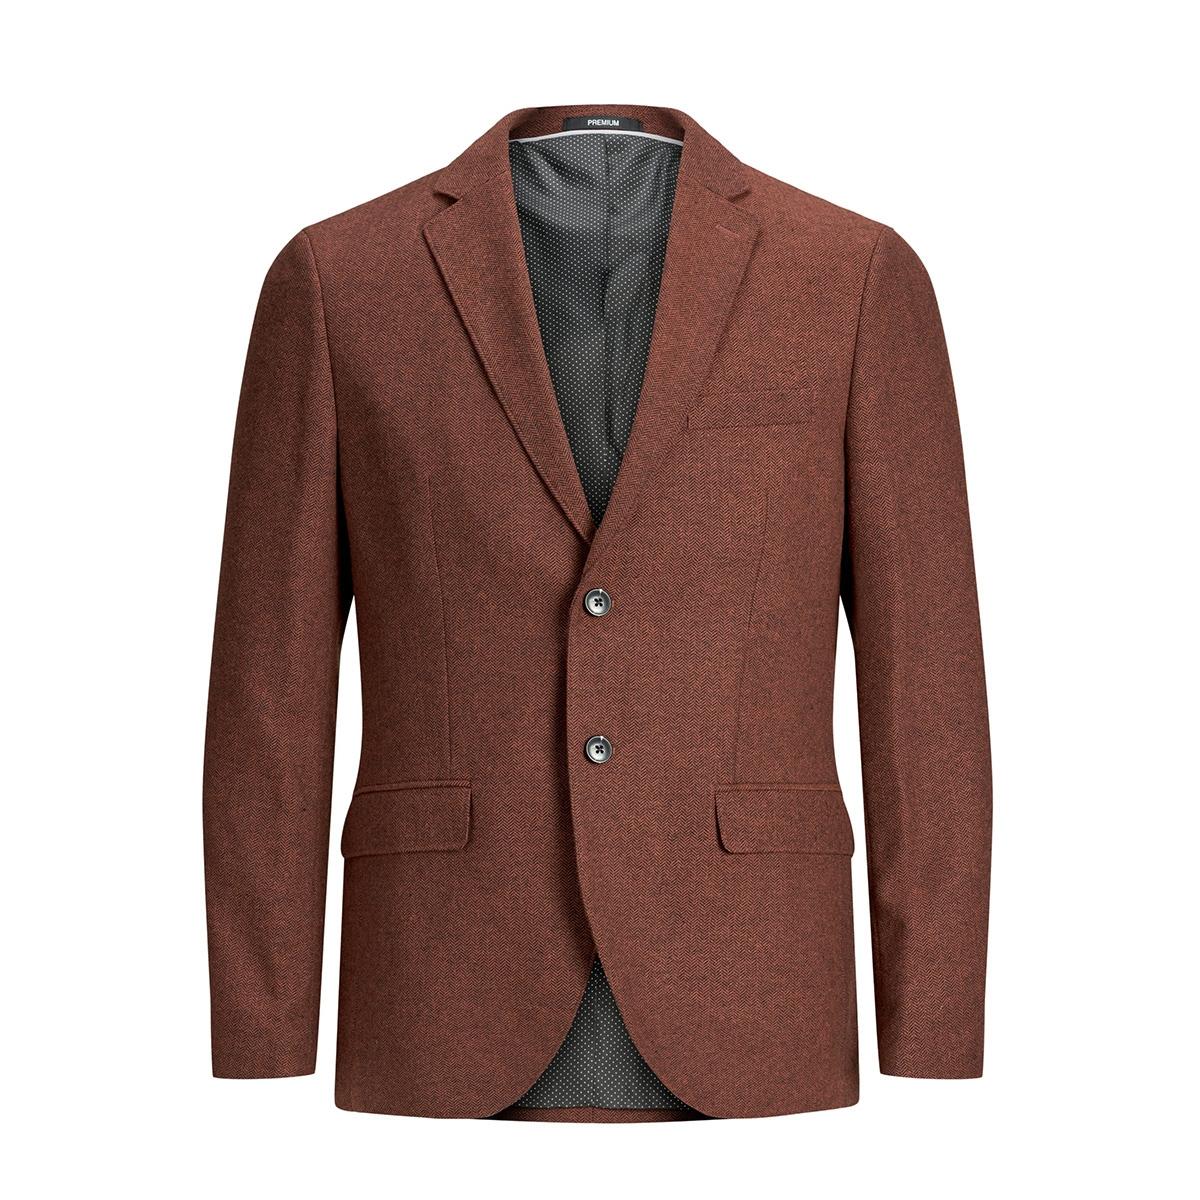 jprcolton  hawk blazer sts 12161344 jack & jones colbert picante/slim fit